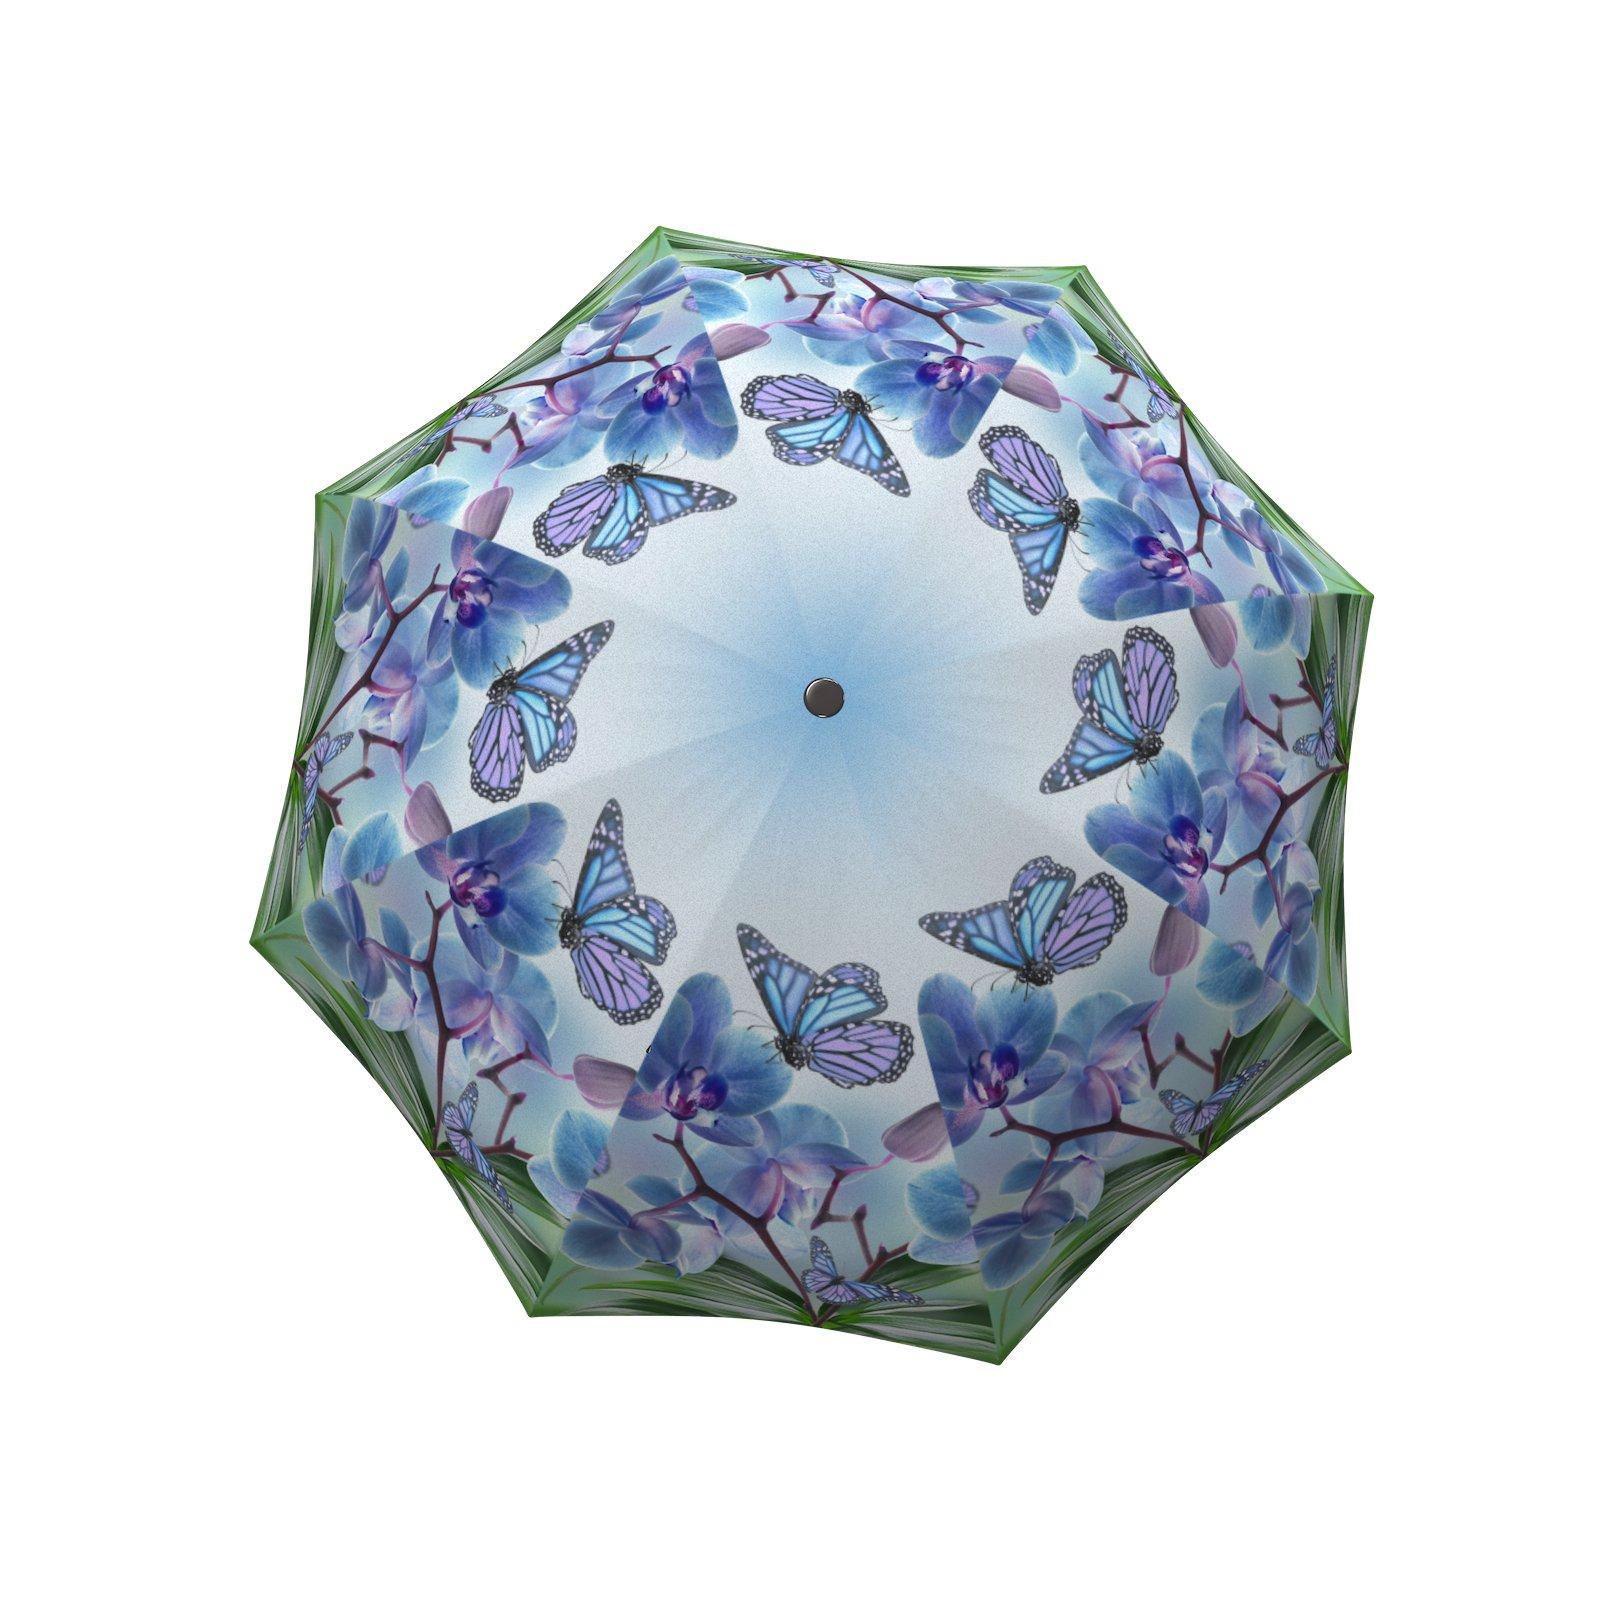 Fashion Umbrella Stylish Gift - Compact Automatic Rain Umbrella Butterfly Design Blue - Designer Umbrella Windproof Auto Open Close - Art Umbrella for Women - Vintage Umbrella Colourful Lightweight